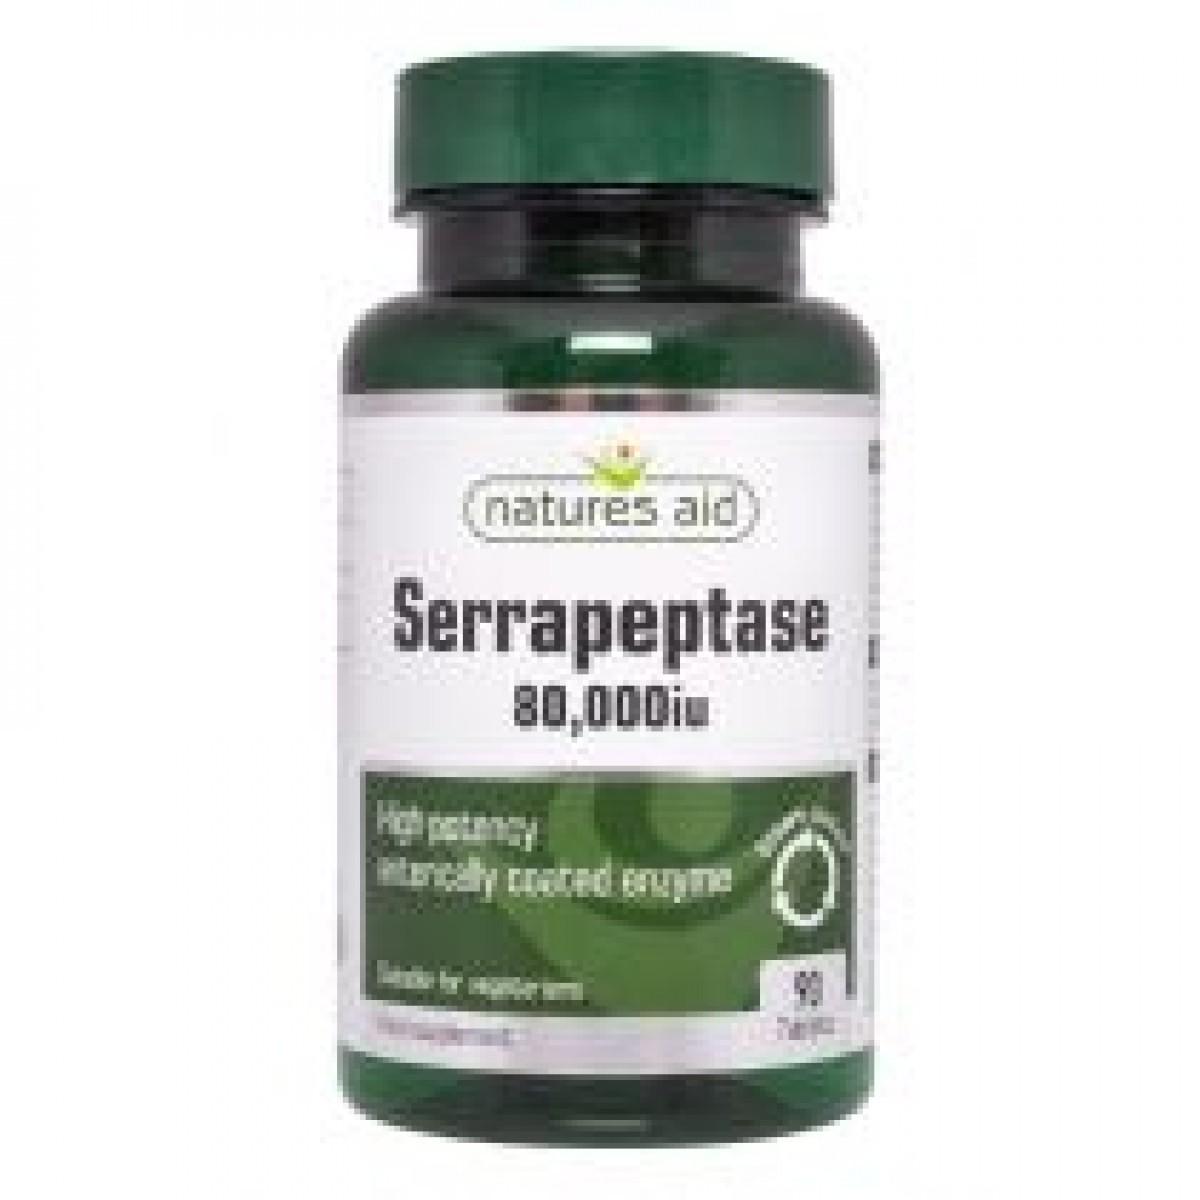 Serrapeptase 80 000iu 90 Tablets 30 Free 120